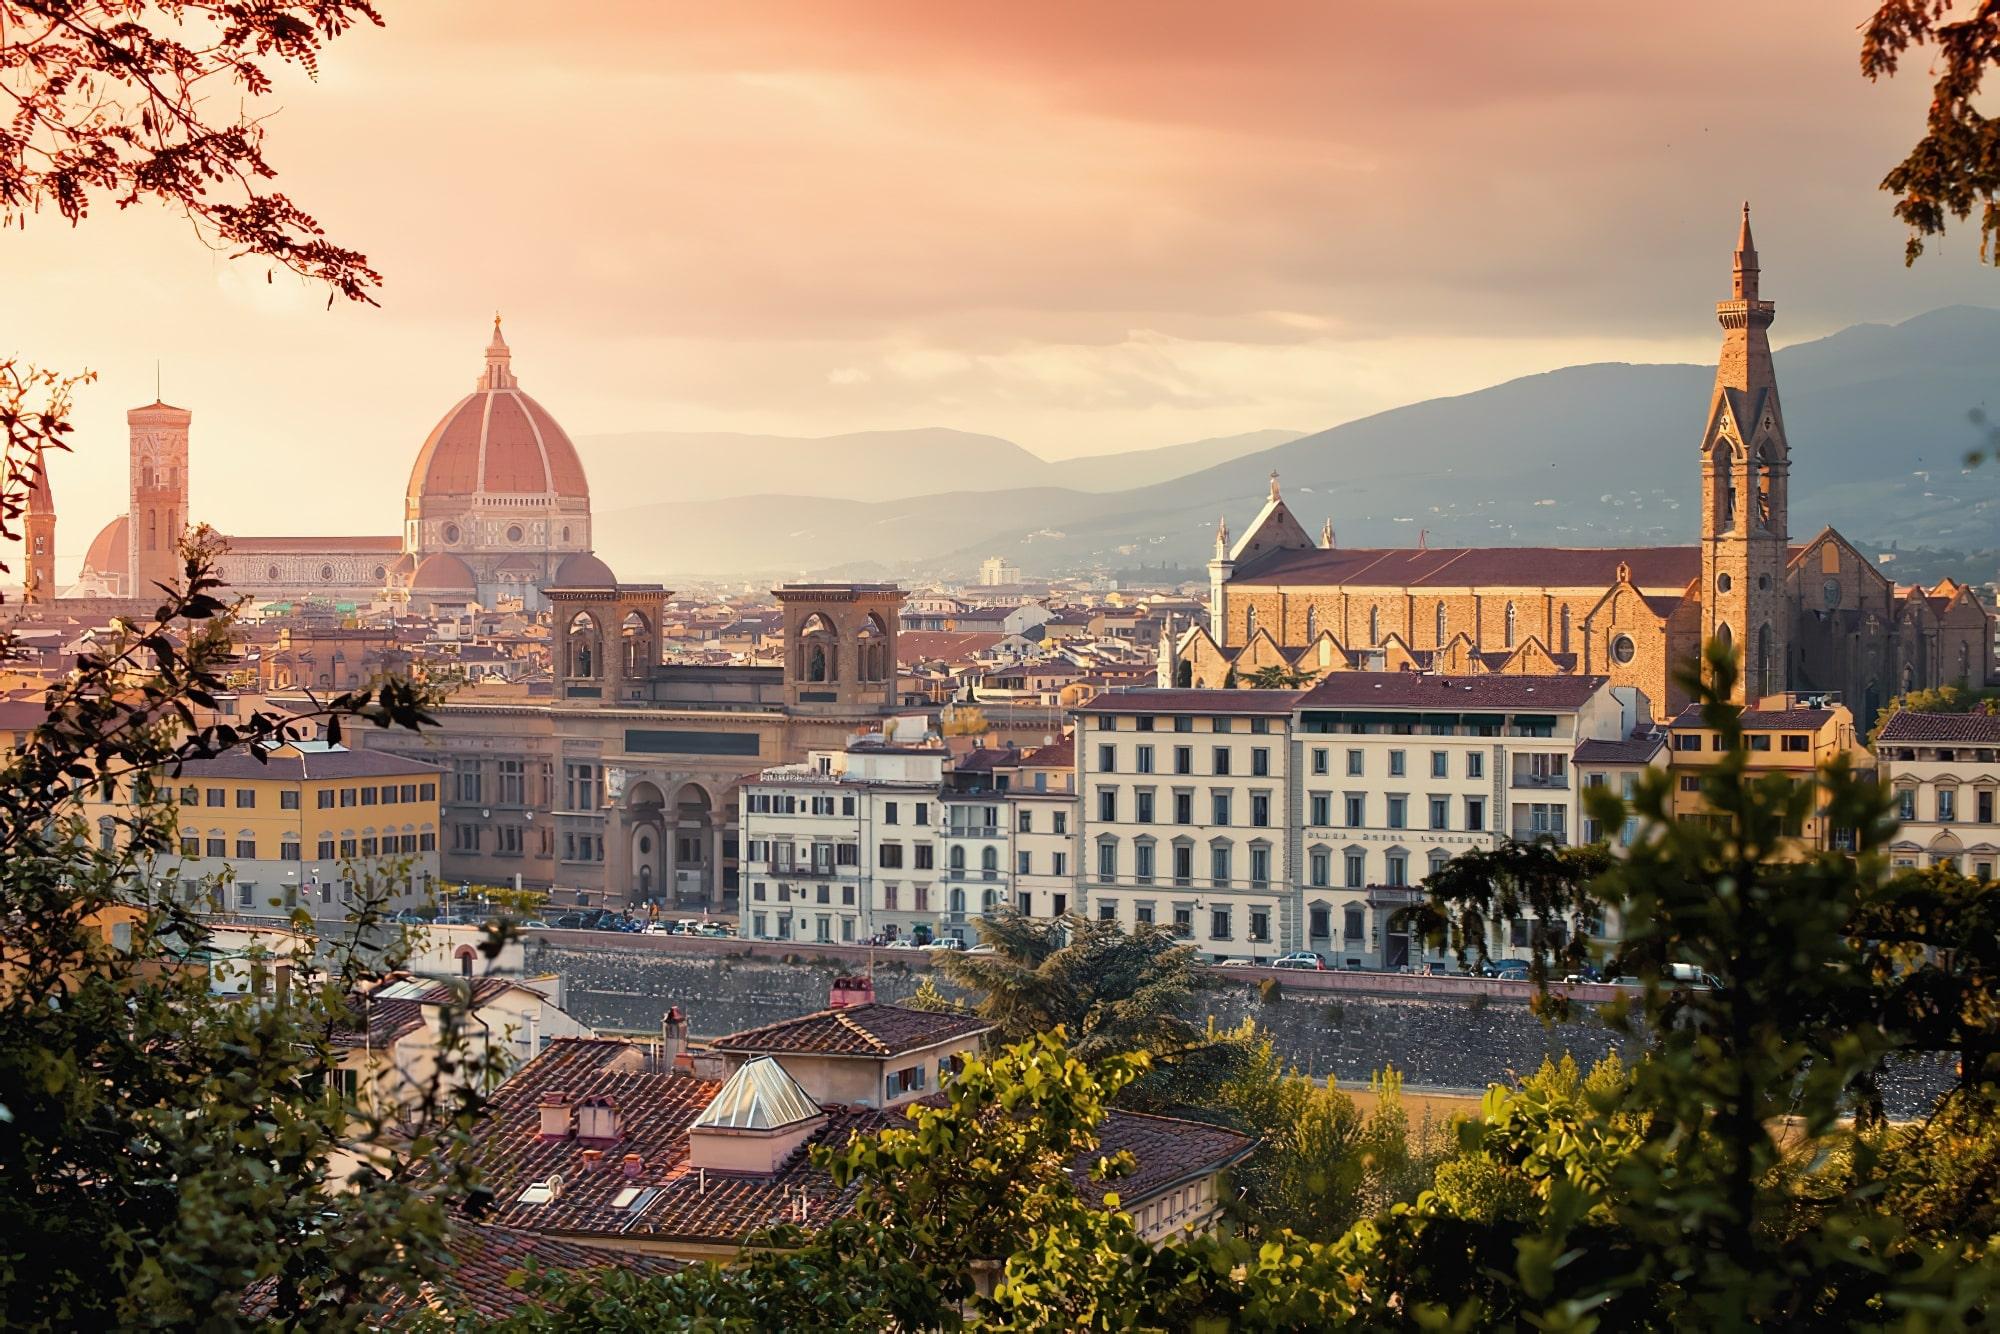 Vue sur la basilique Santa Maria Del Fiore et la basilique Santa Croce au coucher du soleil, Florence, Italie